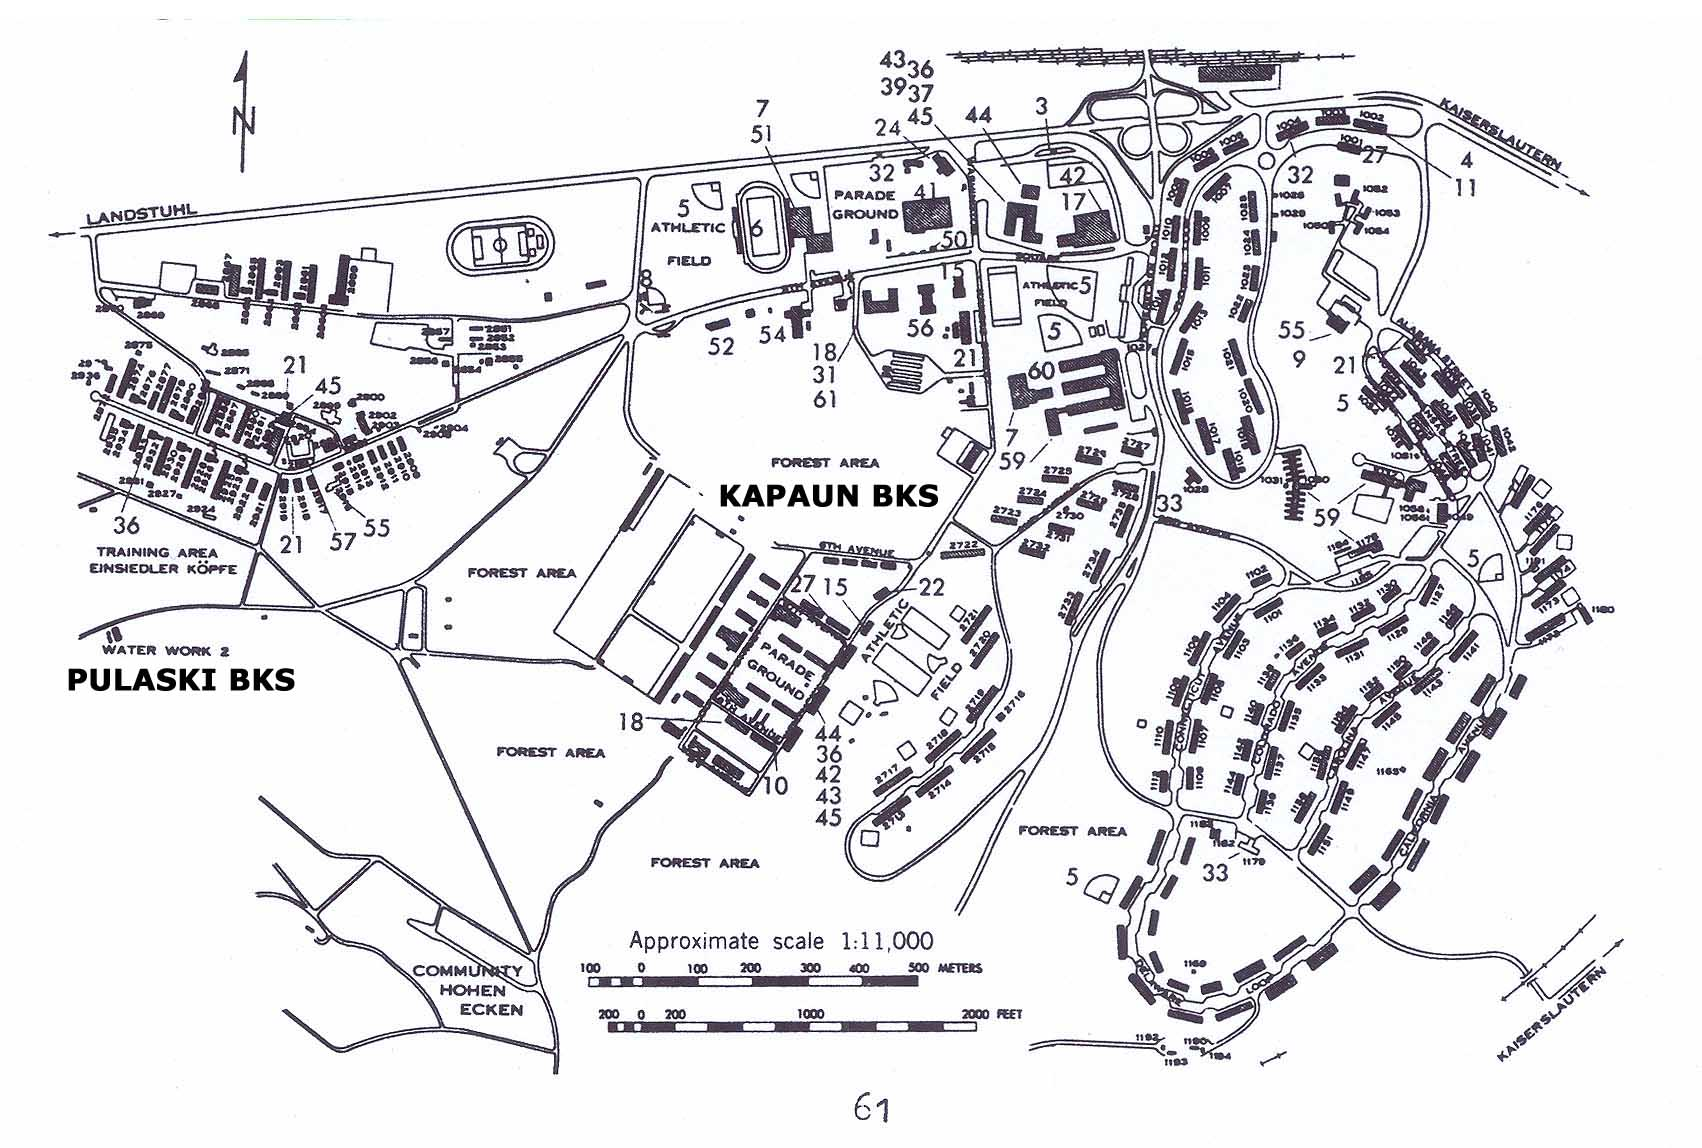 USAREUR Installation Maps - Pulaski and Kapaun late 1970s